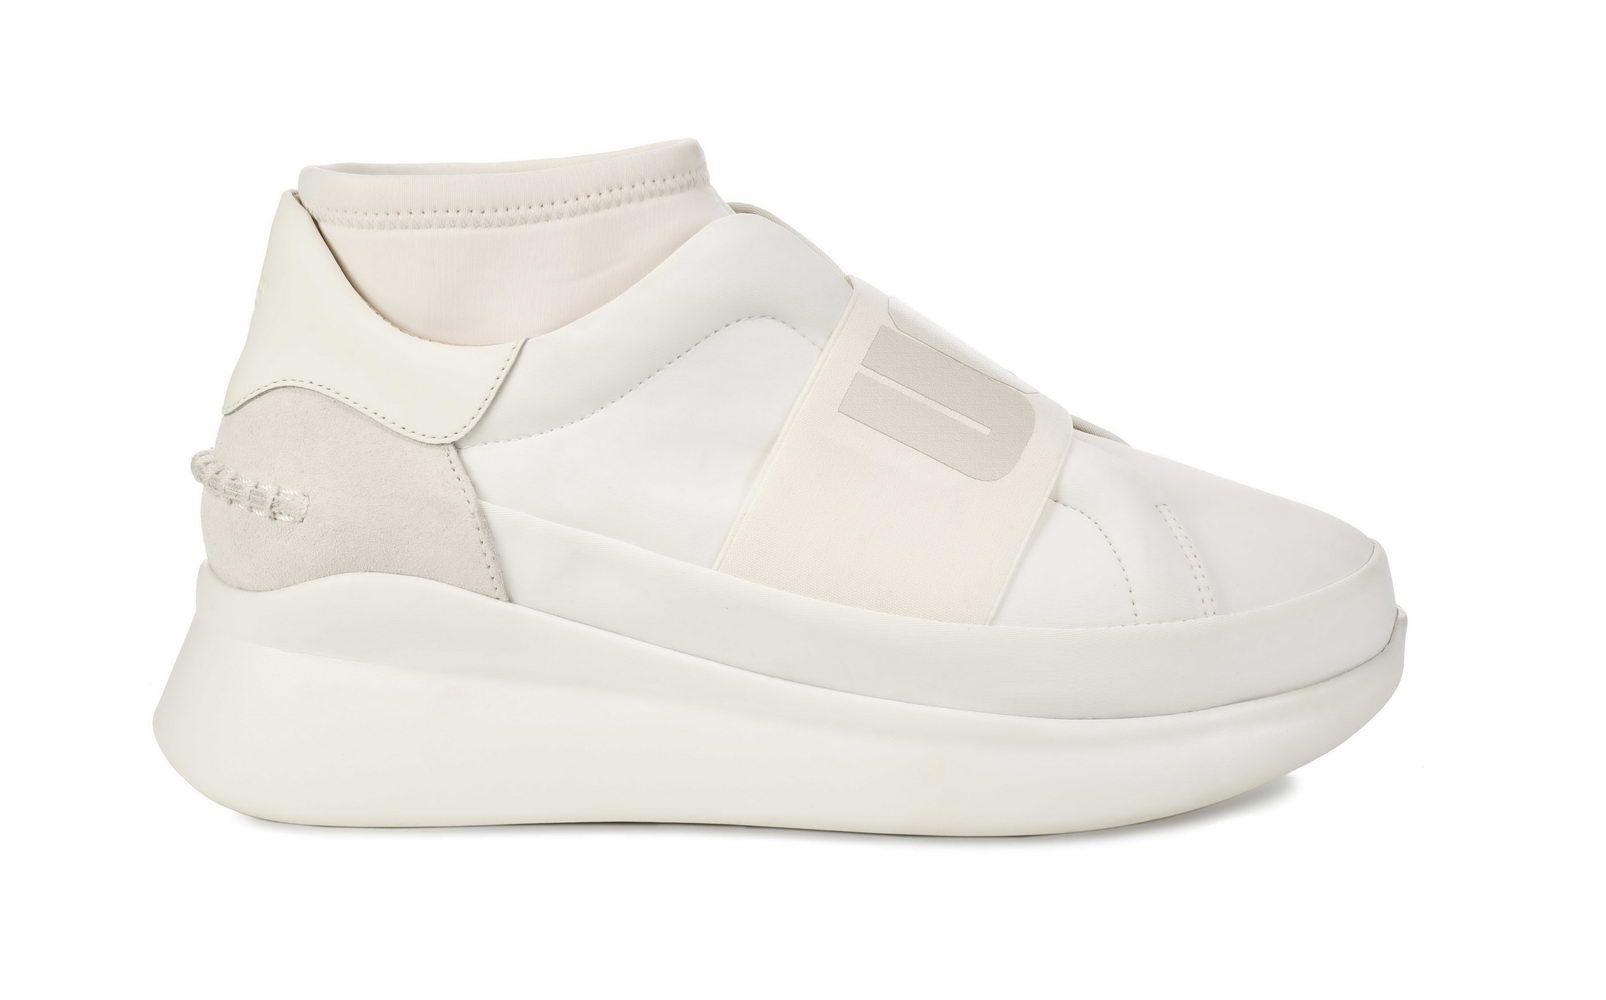 W_Neutra_Sneaker_(1095097-CMLK)_(1).PVP.139.00__resize